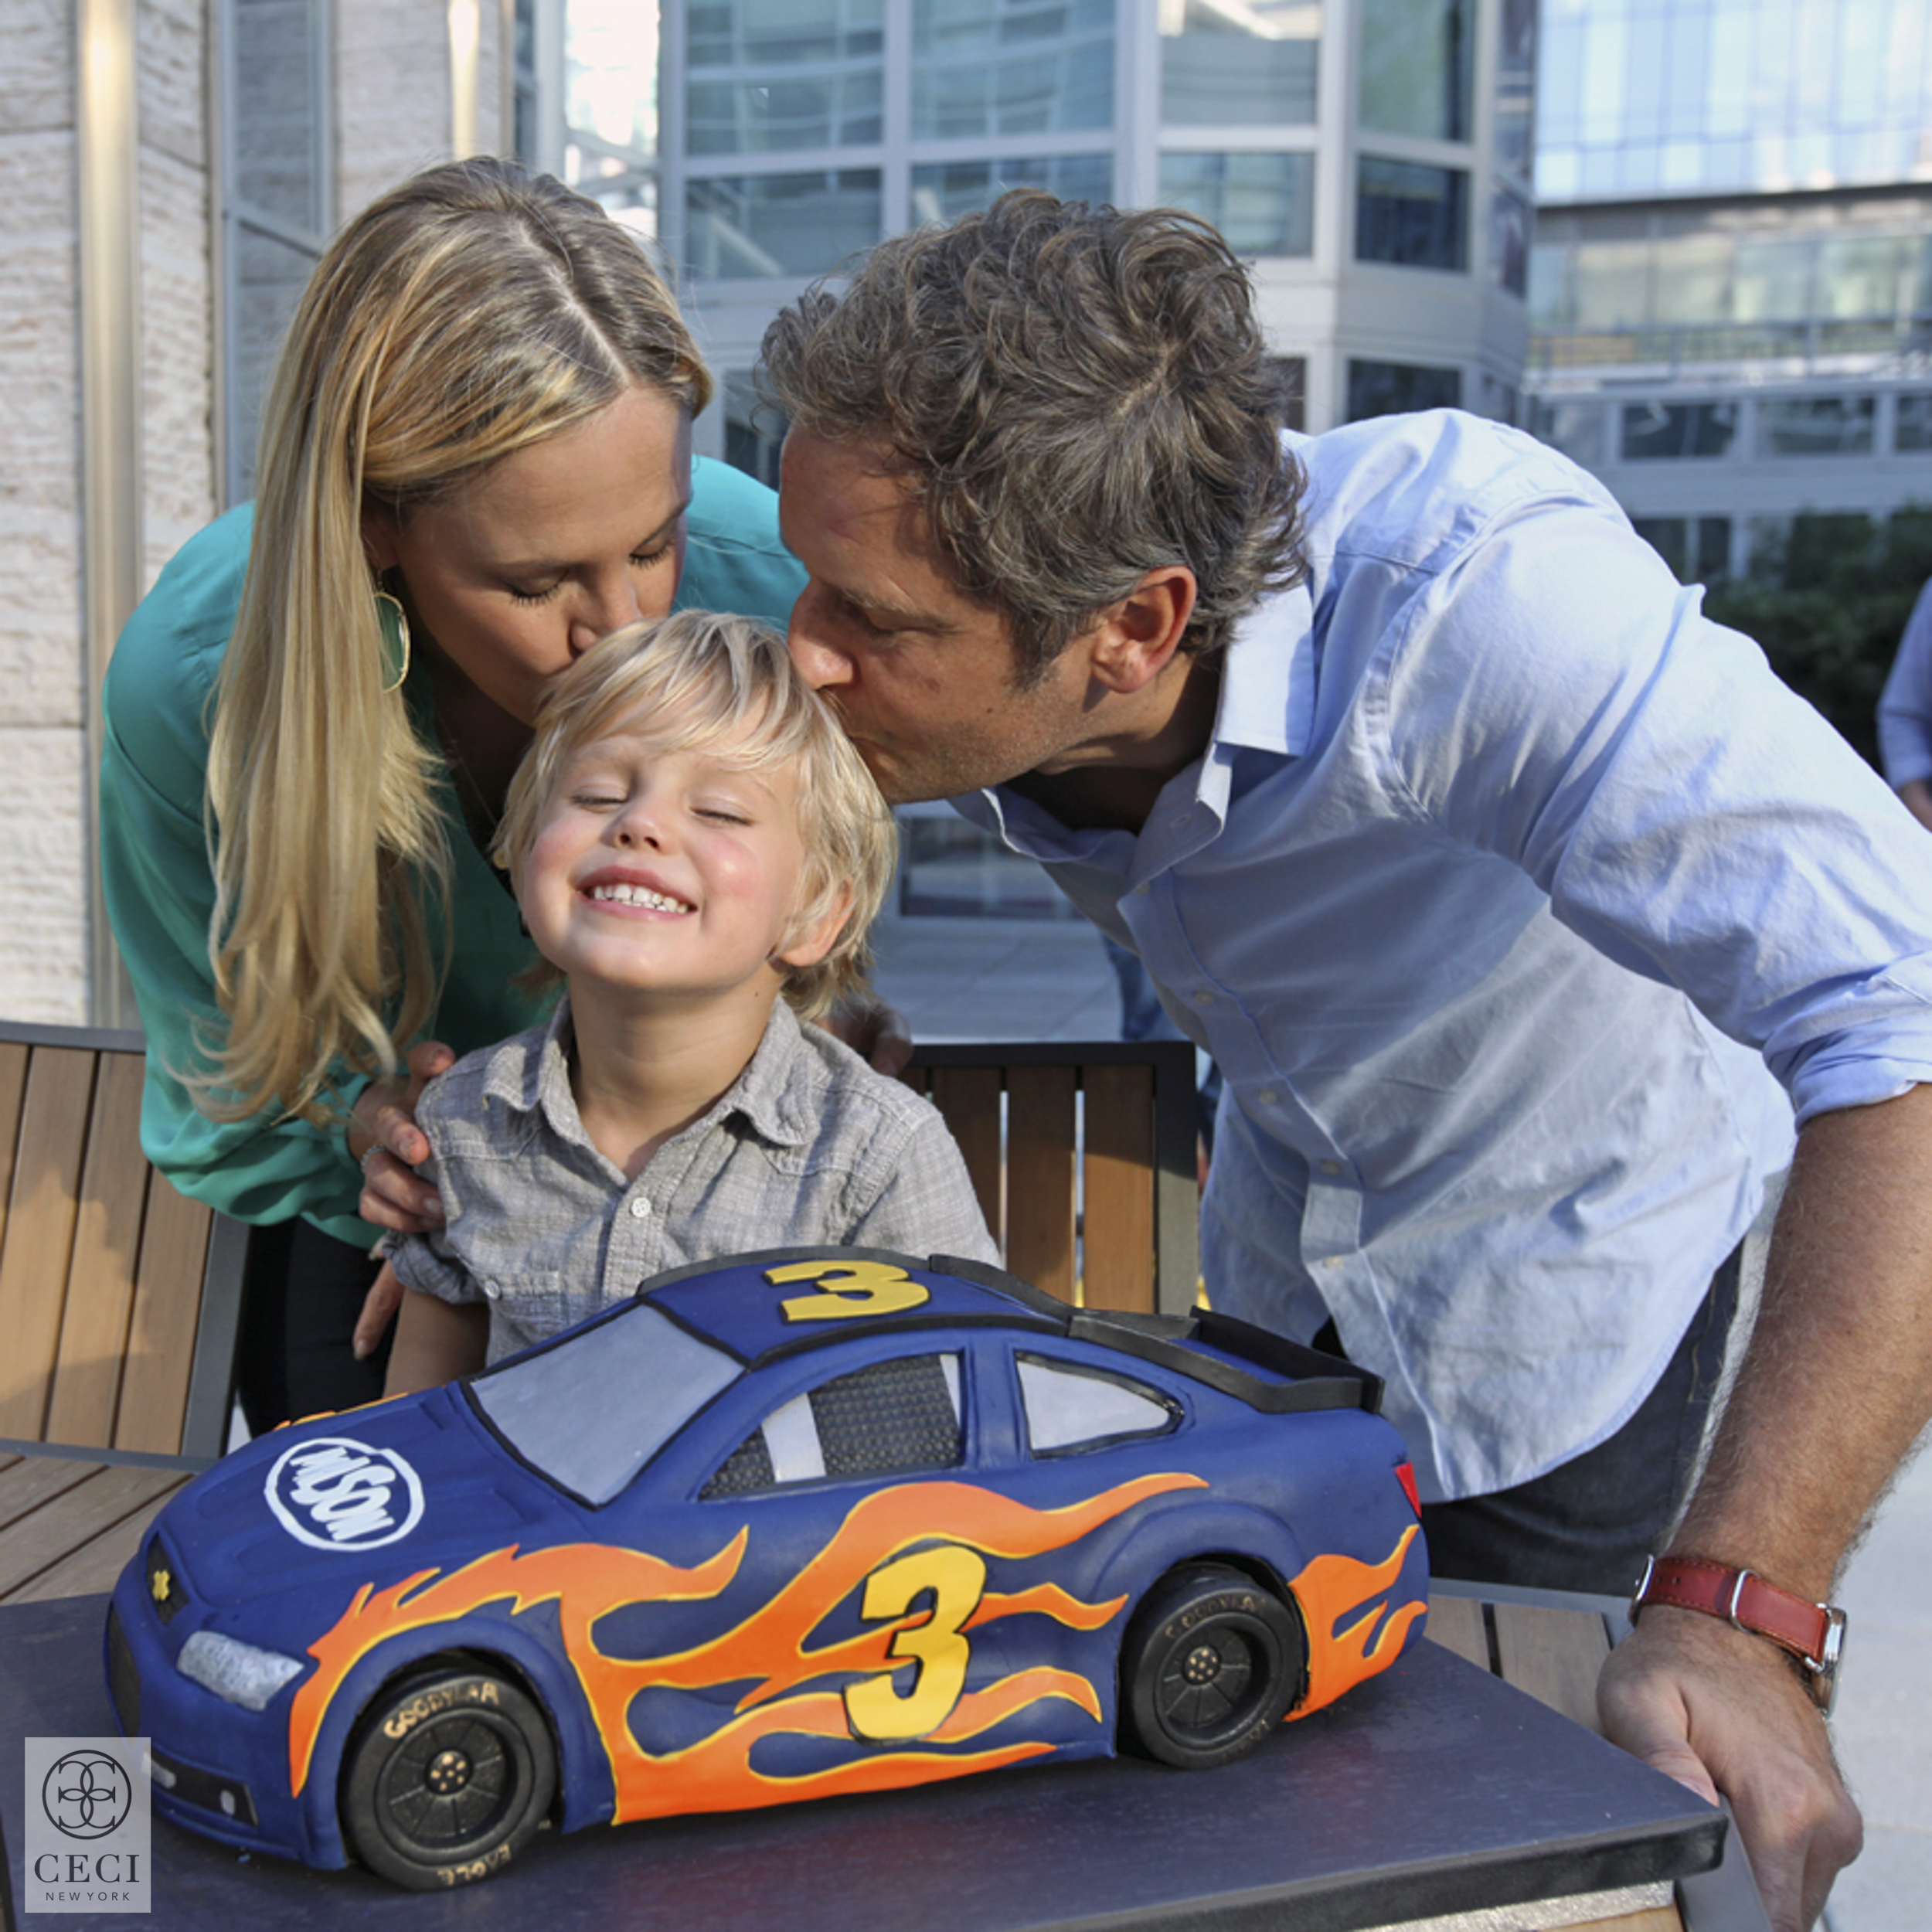 ceci_new_york_mason_ceci_johnson_race_car_birthday_party-1.jpg